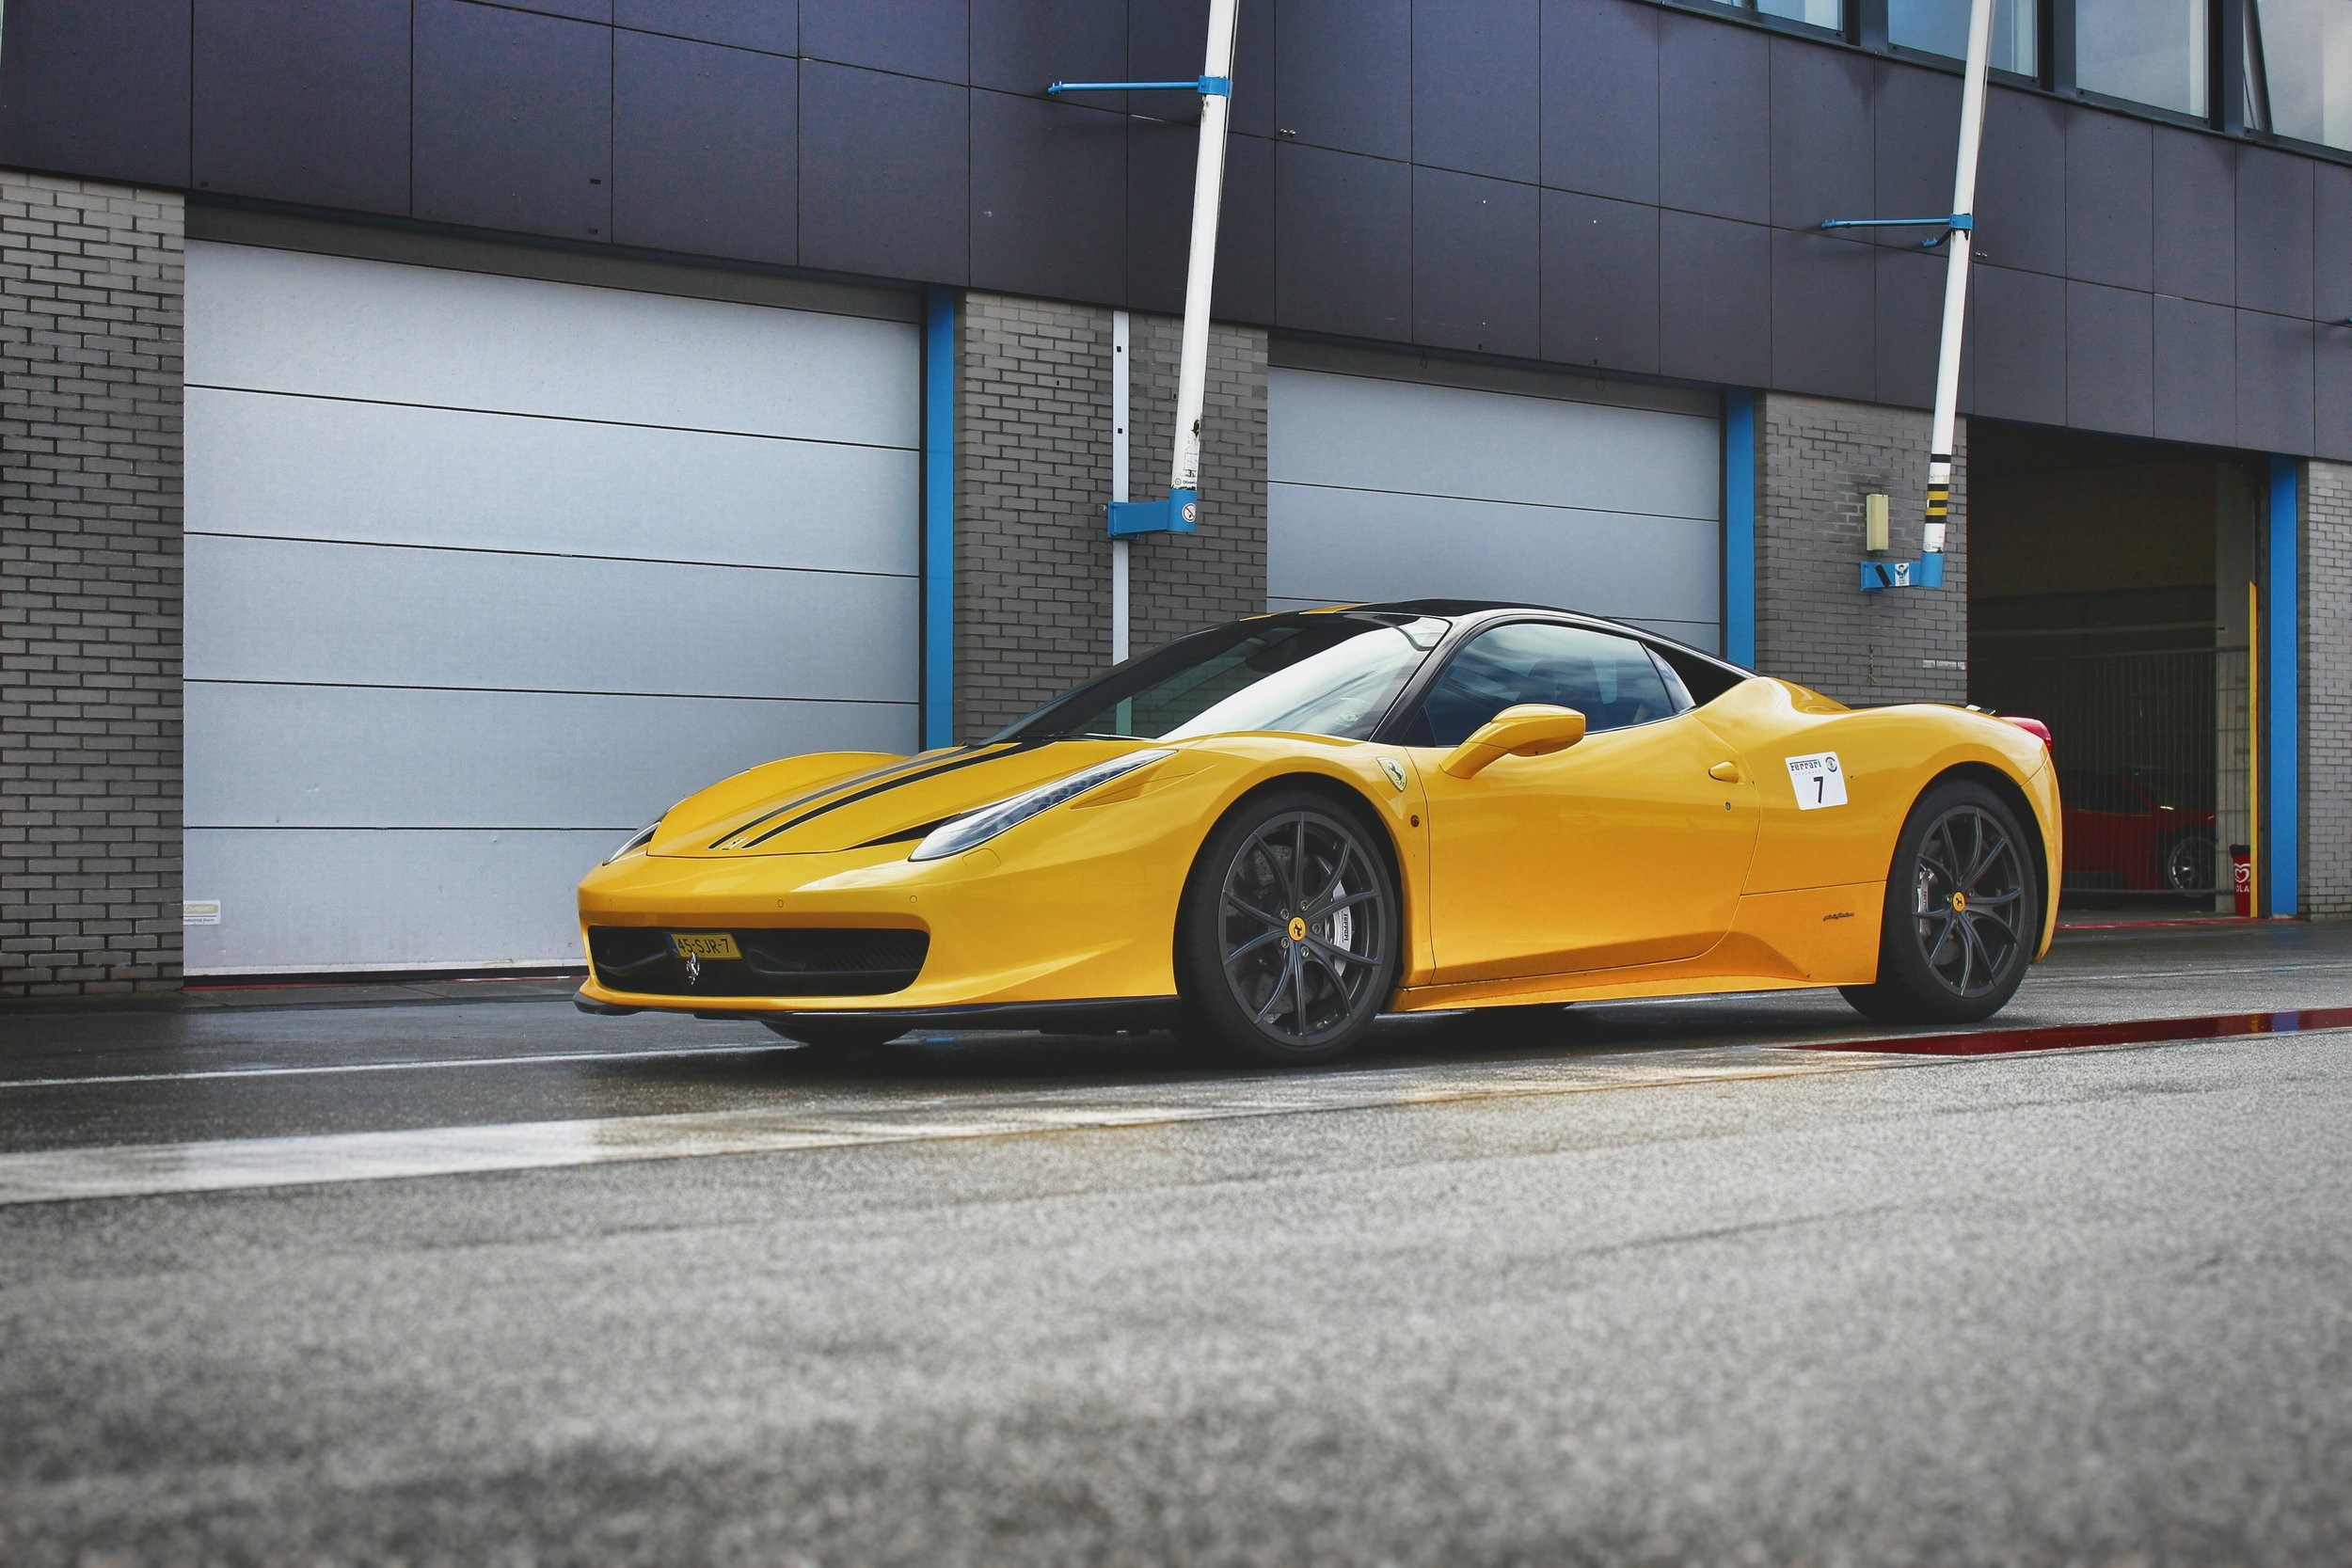 asphalt-automobile-automotive-724493.jpg